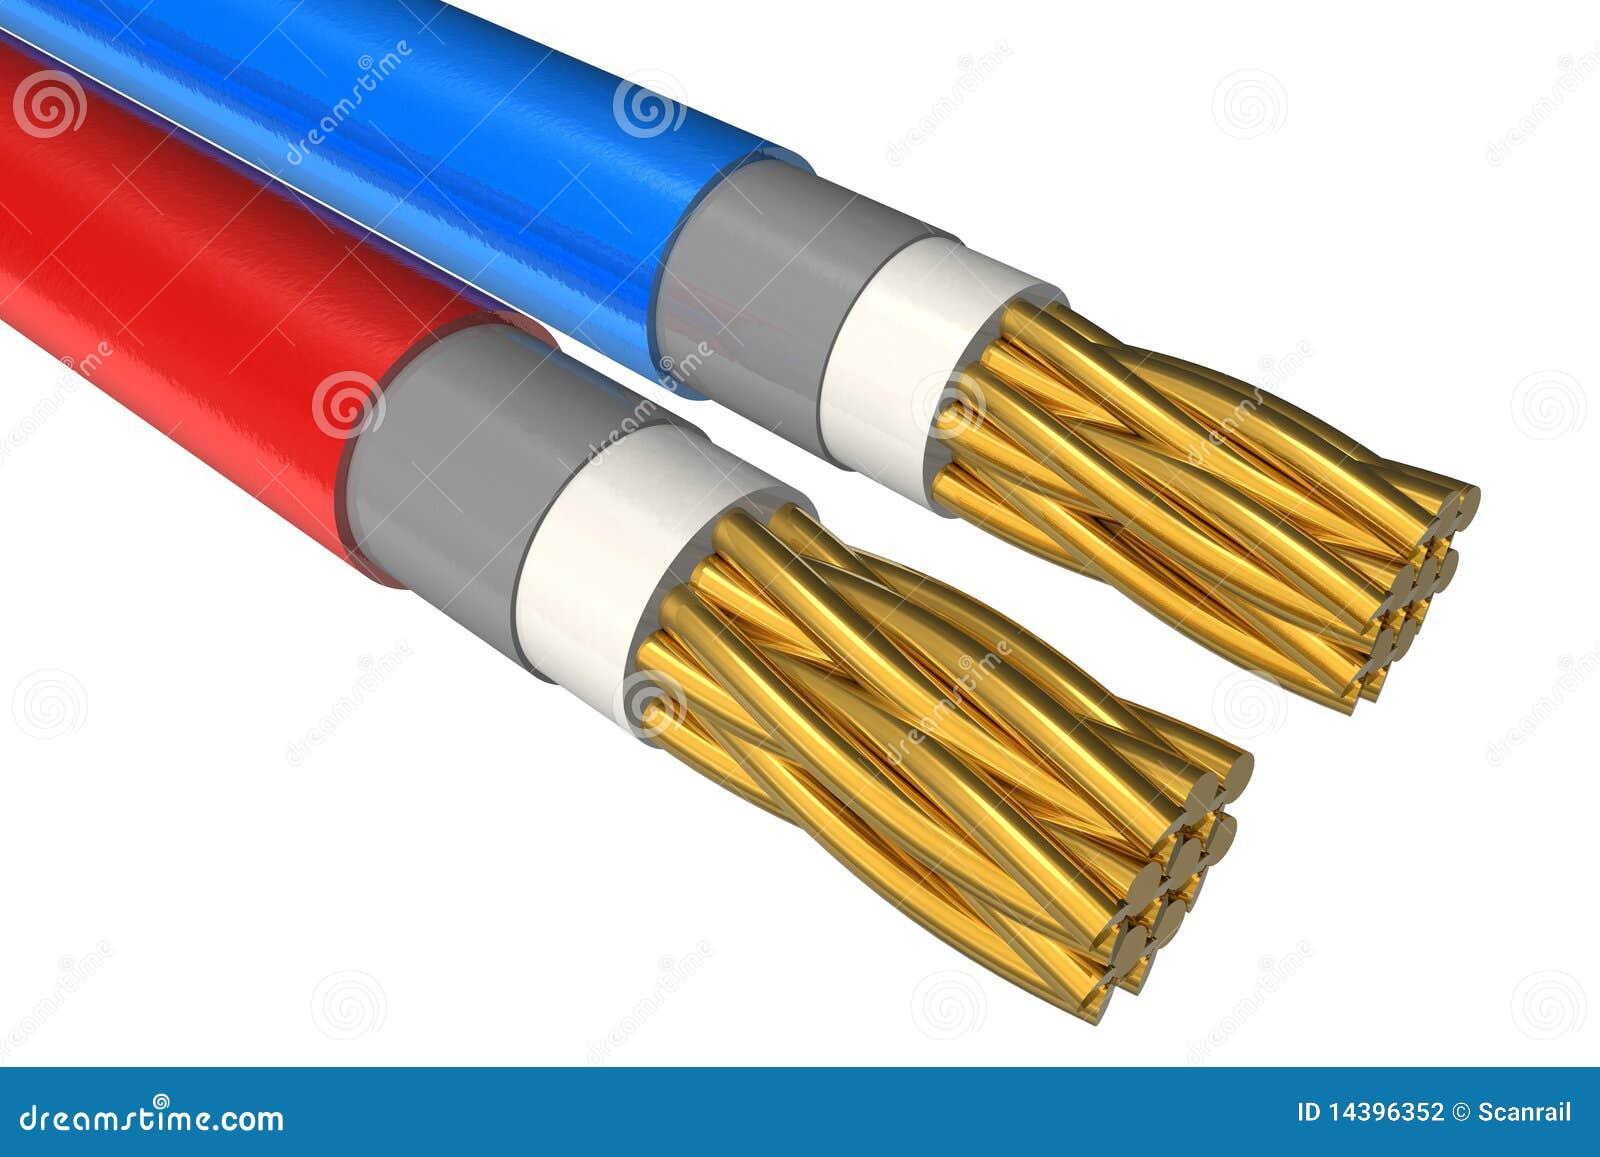 High Voltage Power Cable : High voltage power cable close up stock illustration